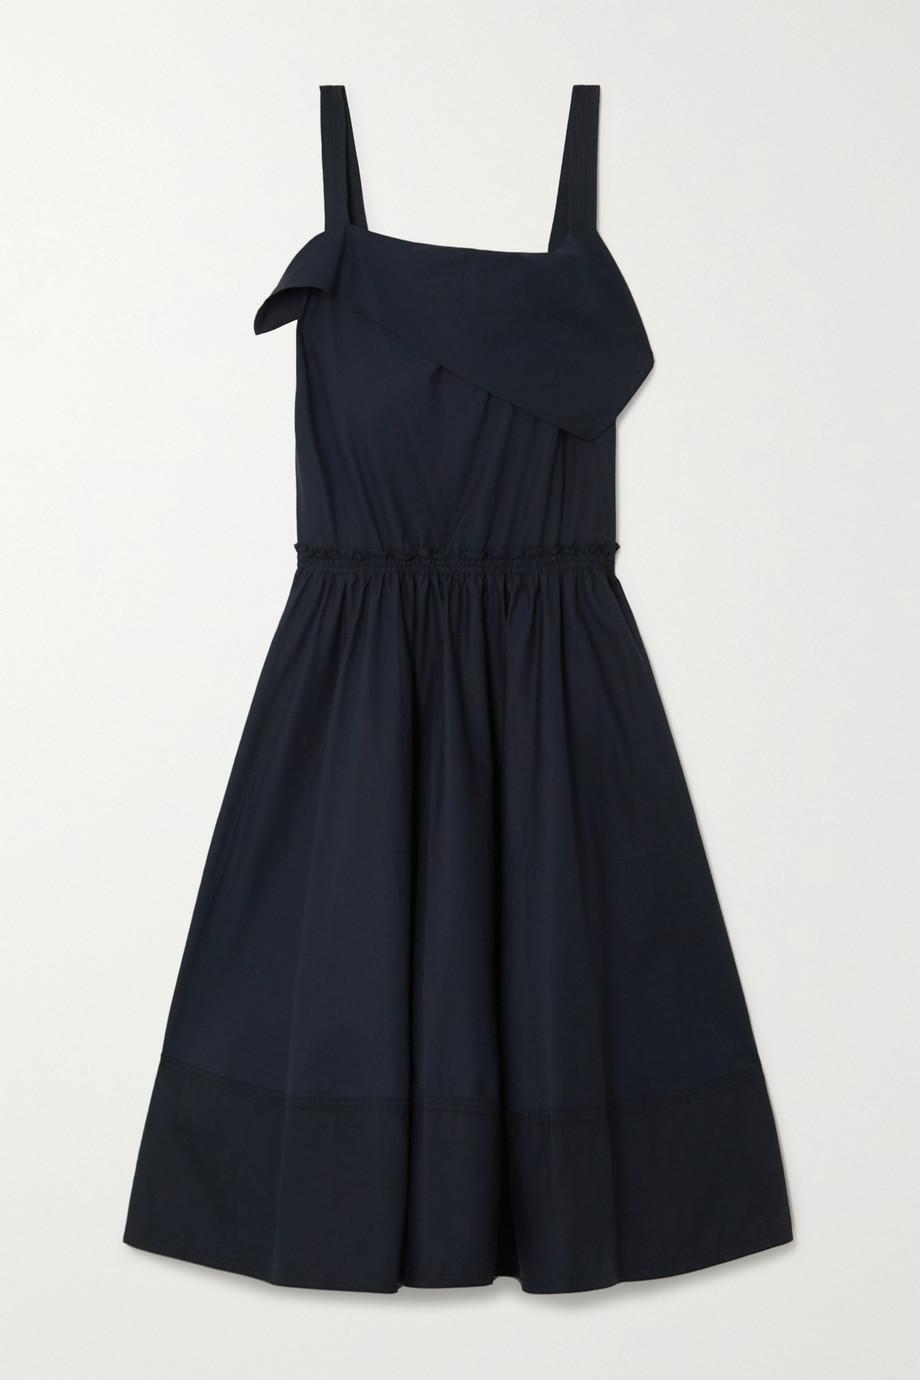 Proenza Schouler White Label Draped cotton-poplin midi dress